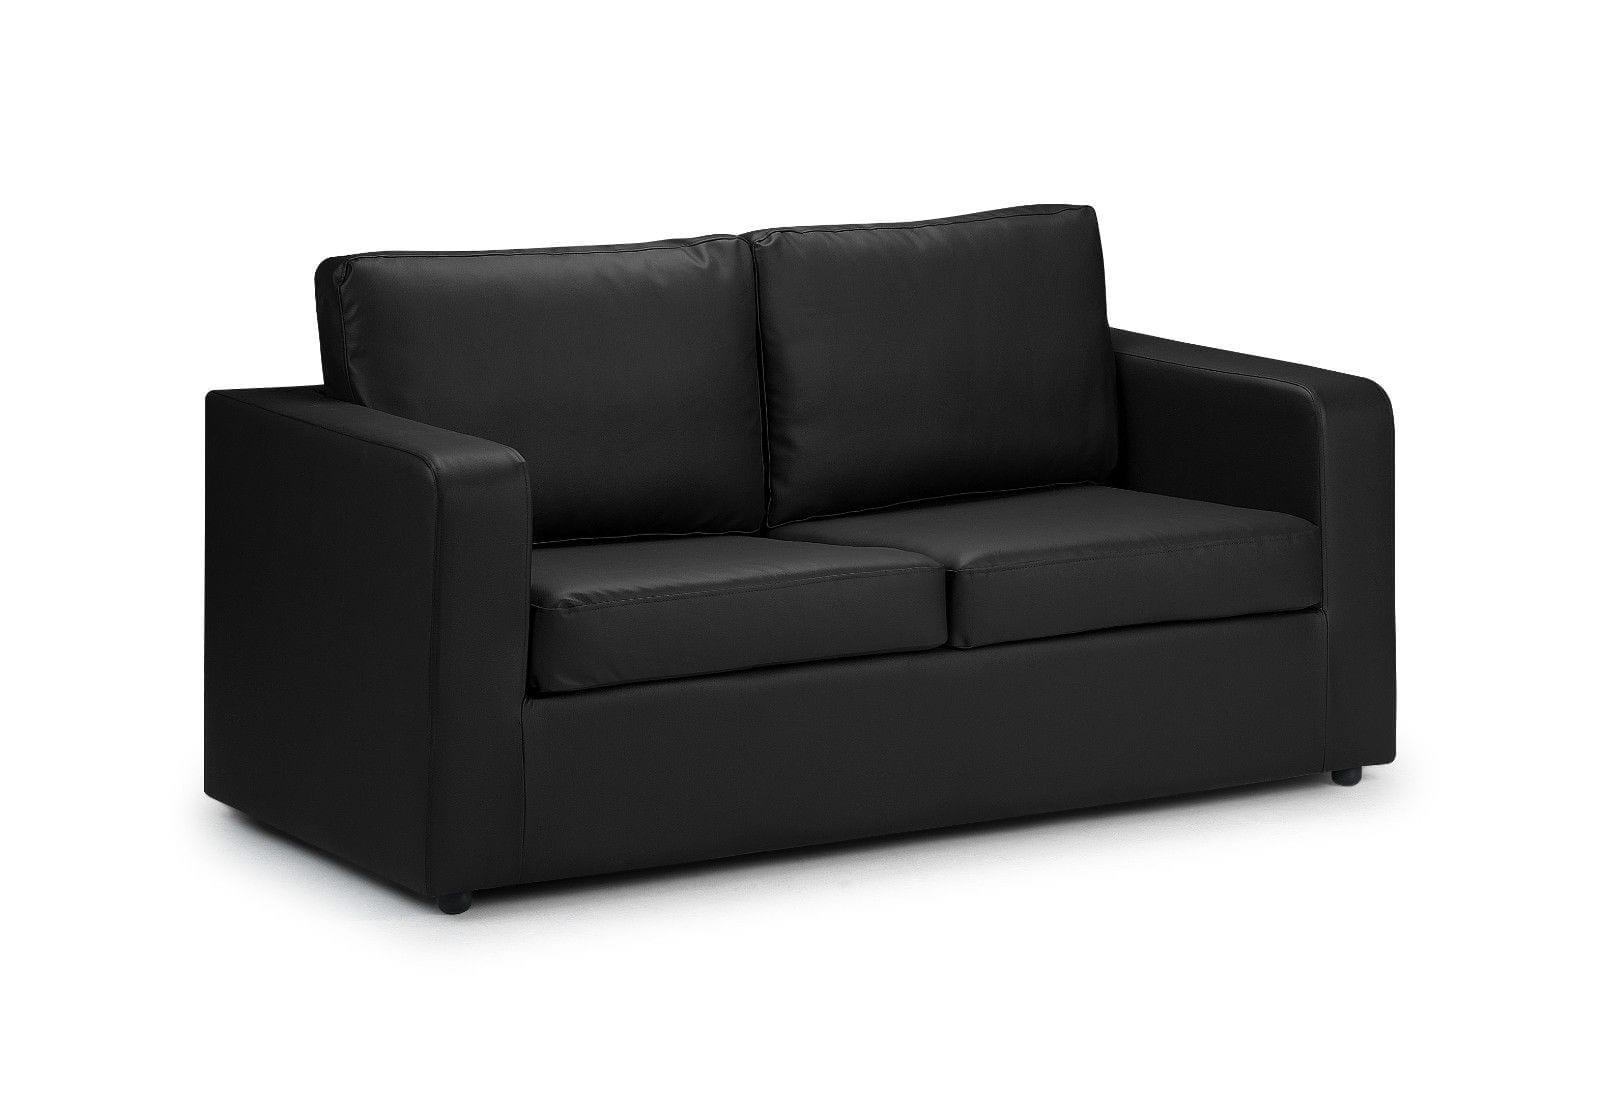 Maxi Sofa Bed Let Us Furnish